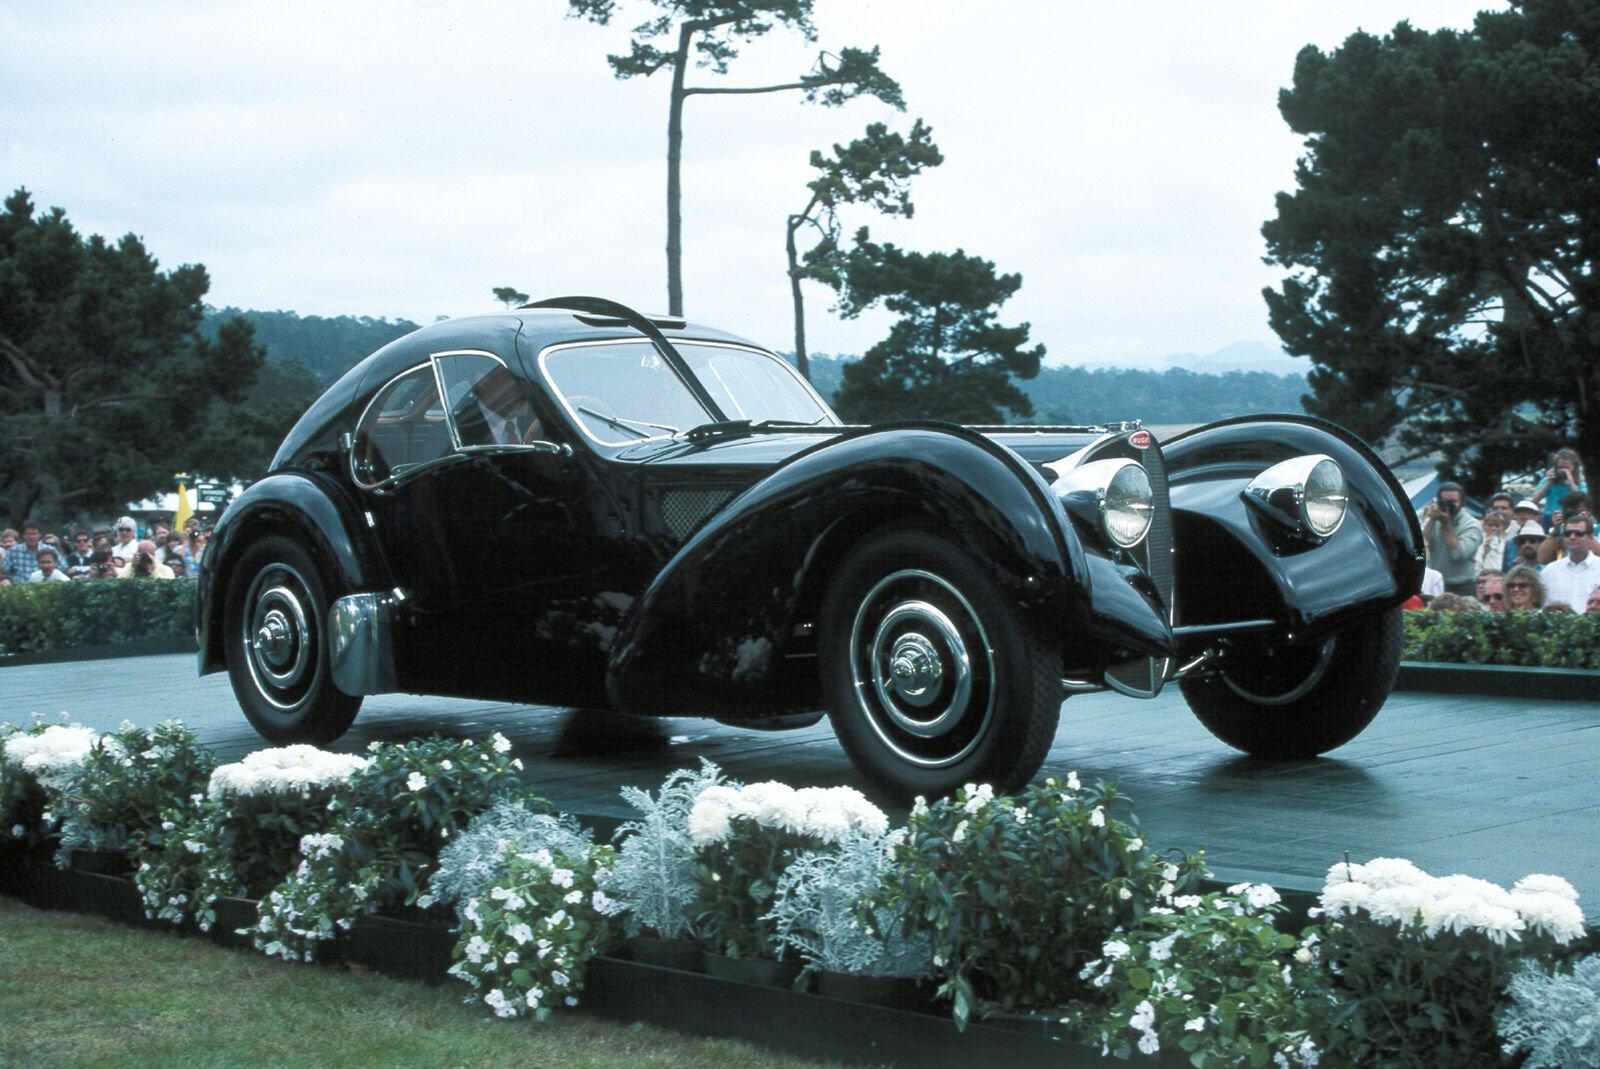 Ralph Lauren's 1938 Bugatti Type 57 S C Atlantic